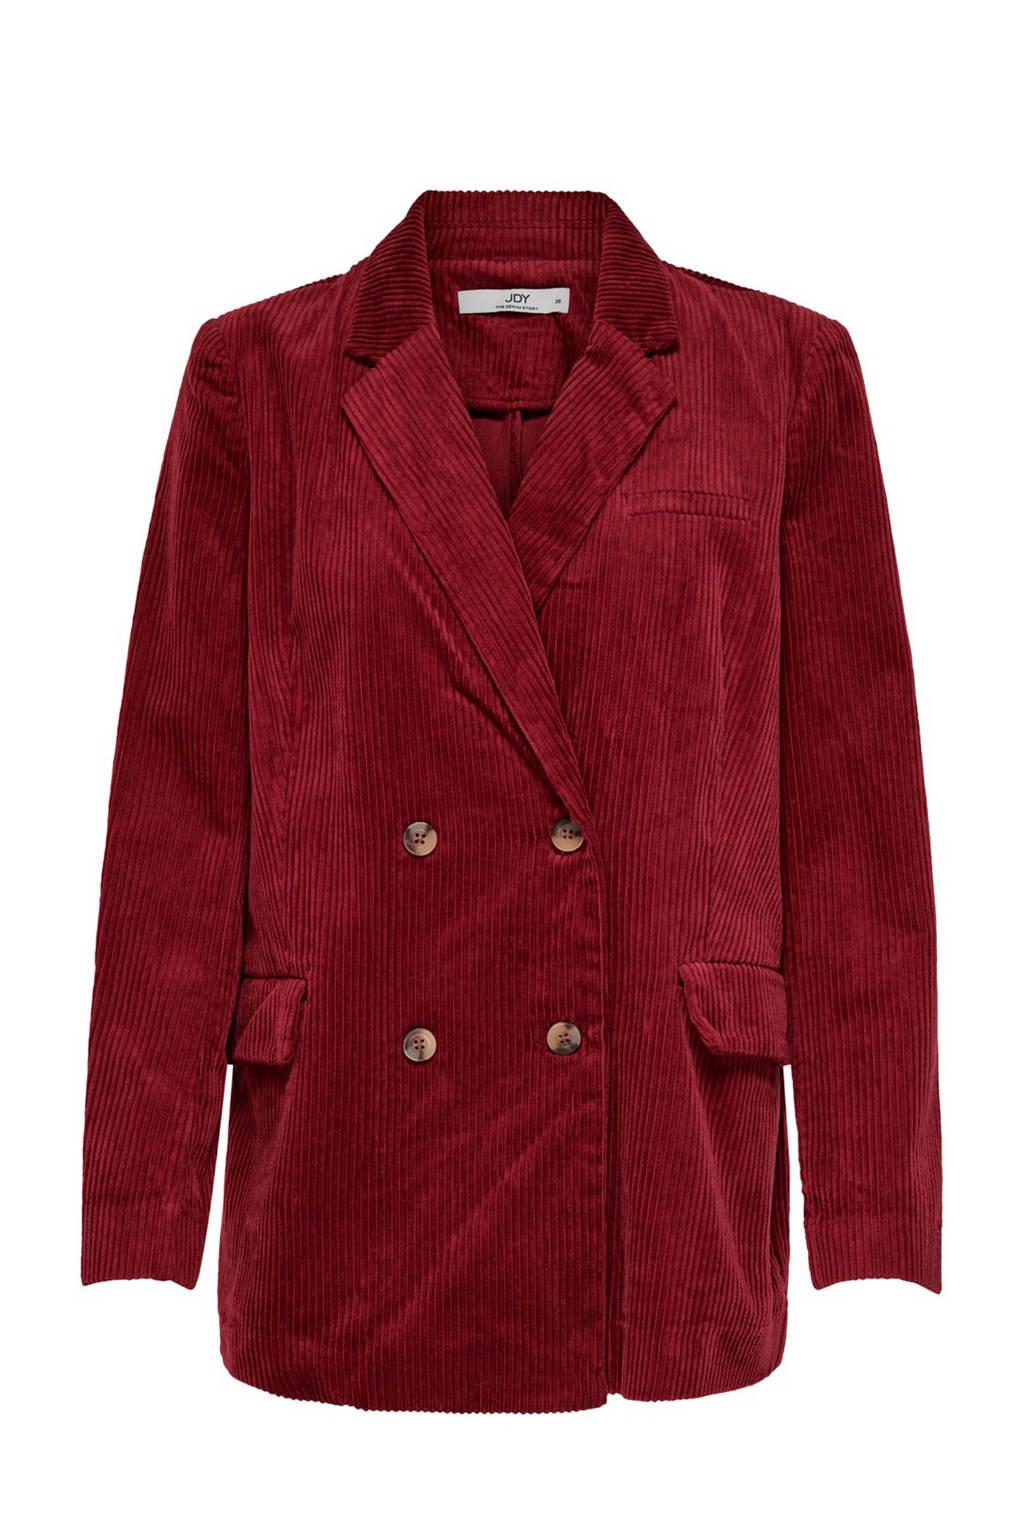 JACQUELINE DE YONG corduroy blazer rood, Rood